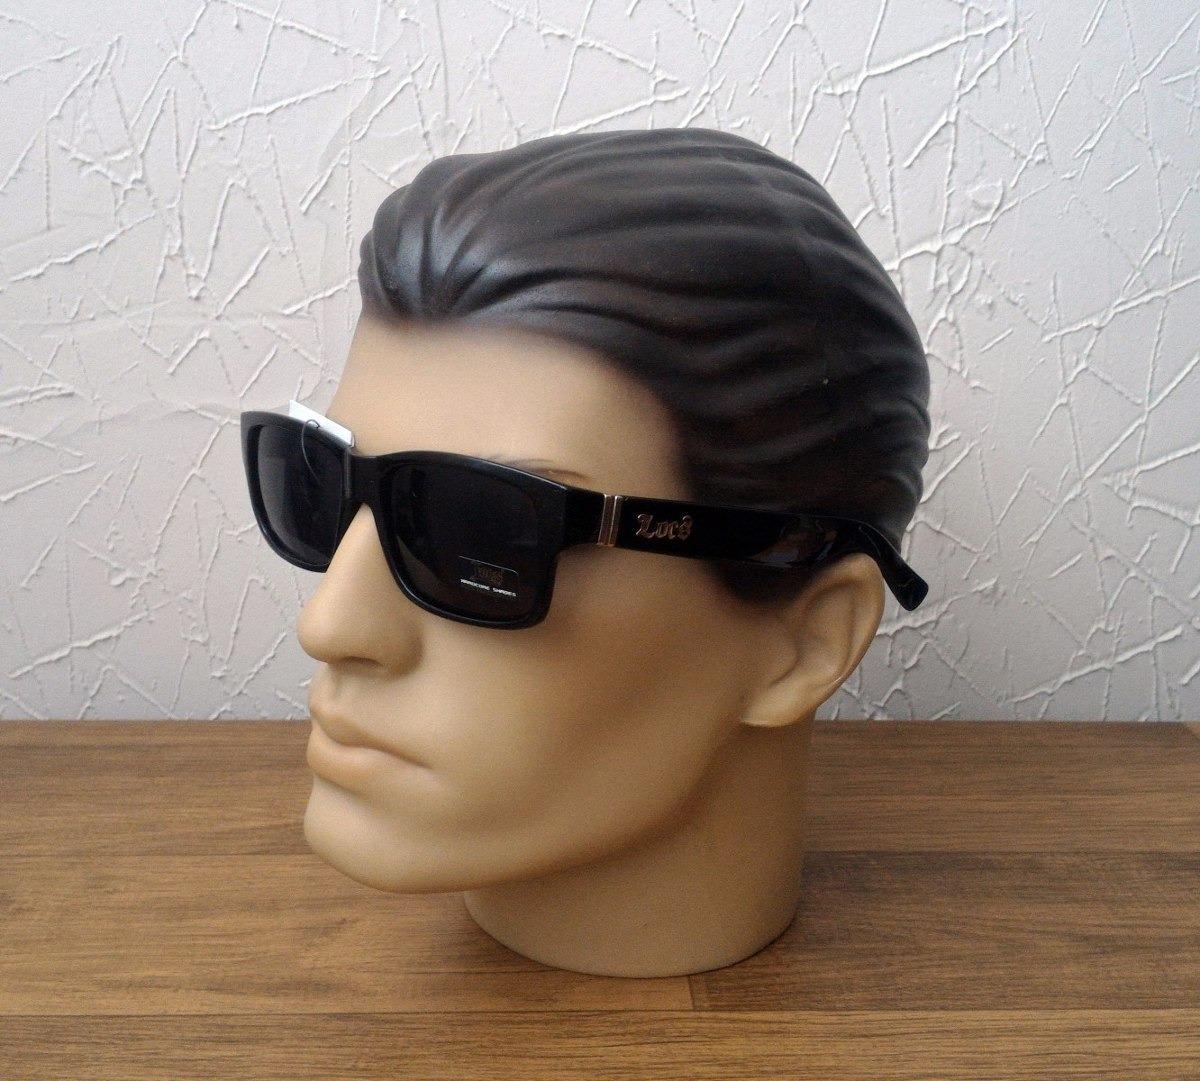 Óculos Locs 91021 Old School Cholo Lowrider - R  94,99 em Mercado Livre 32f0b682d9